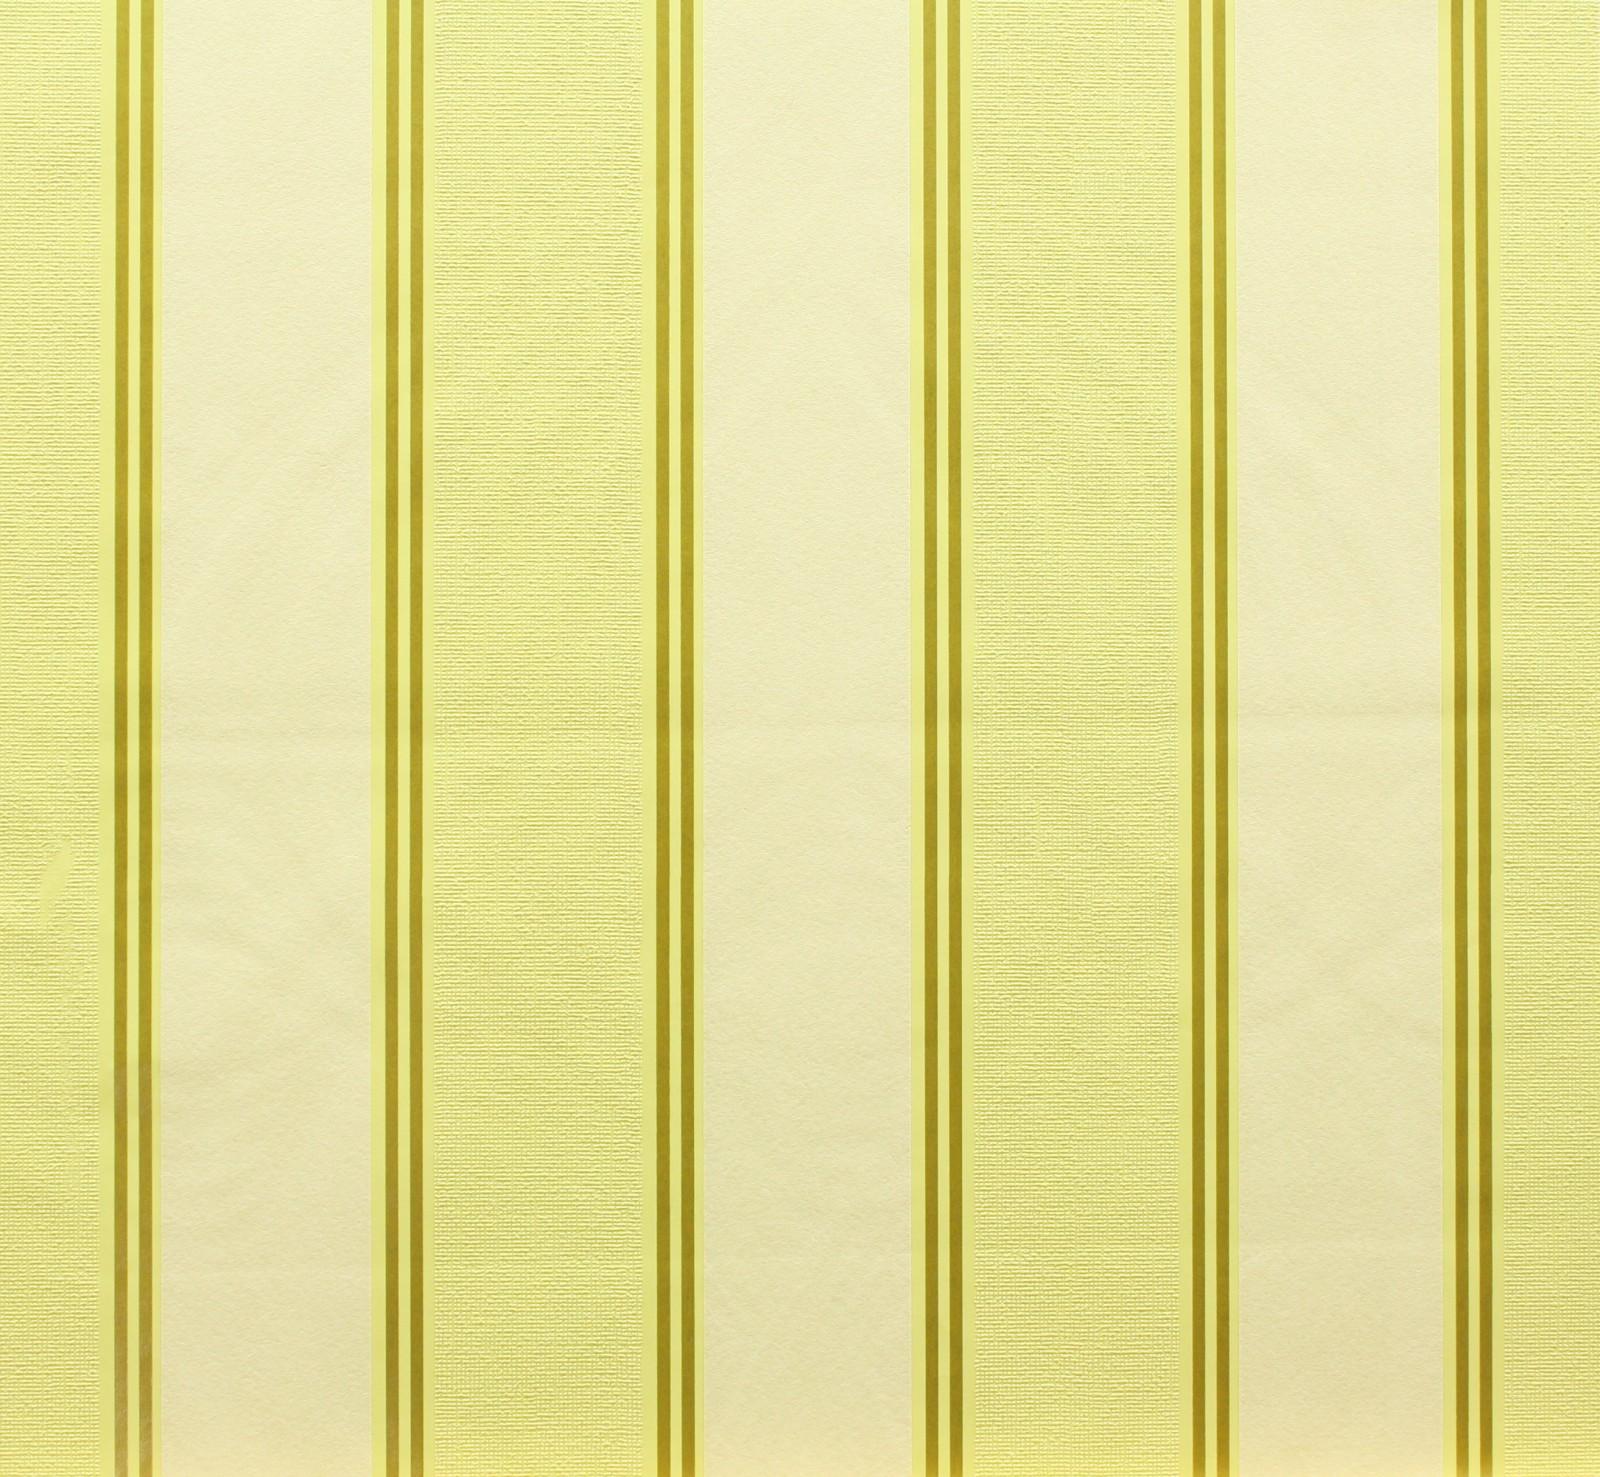 Wallpaper panels marburg 51534 green gold beige non woven wallpaper - Tapete schlafzimmer beige ...